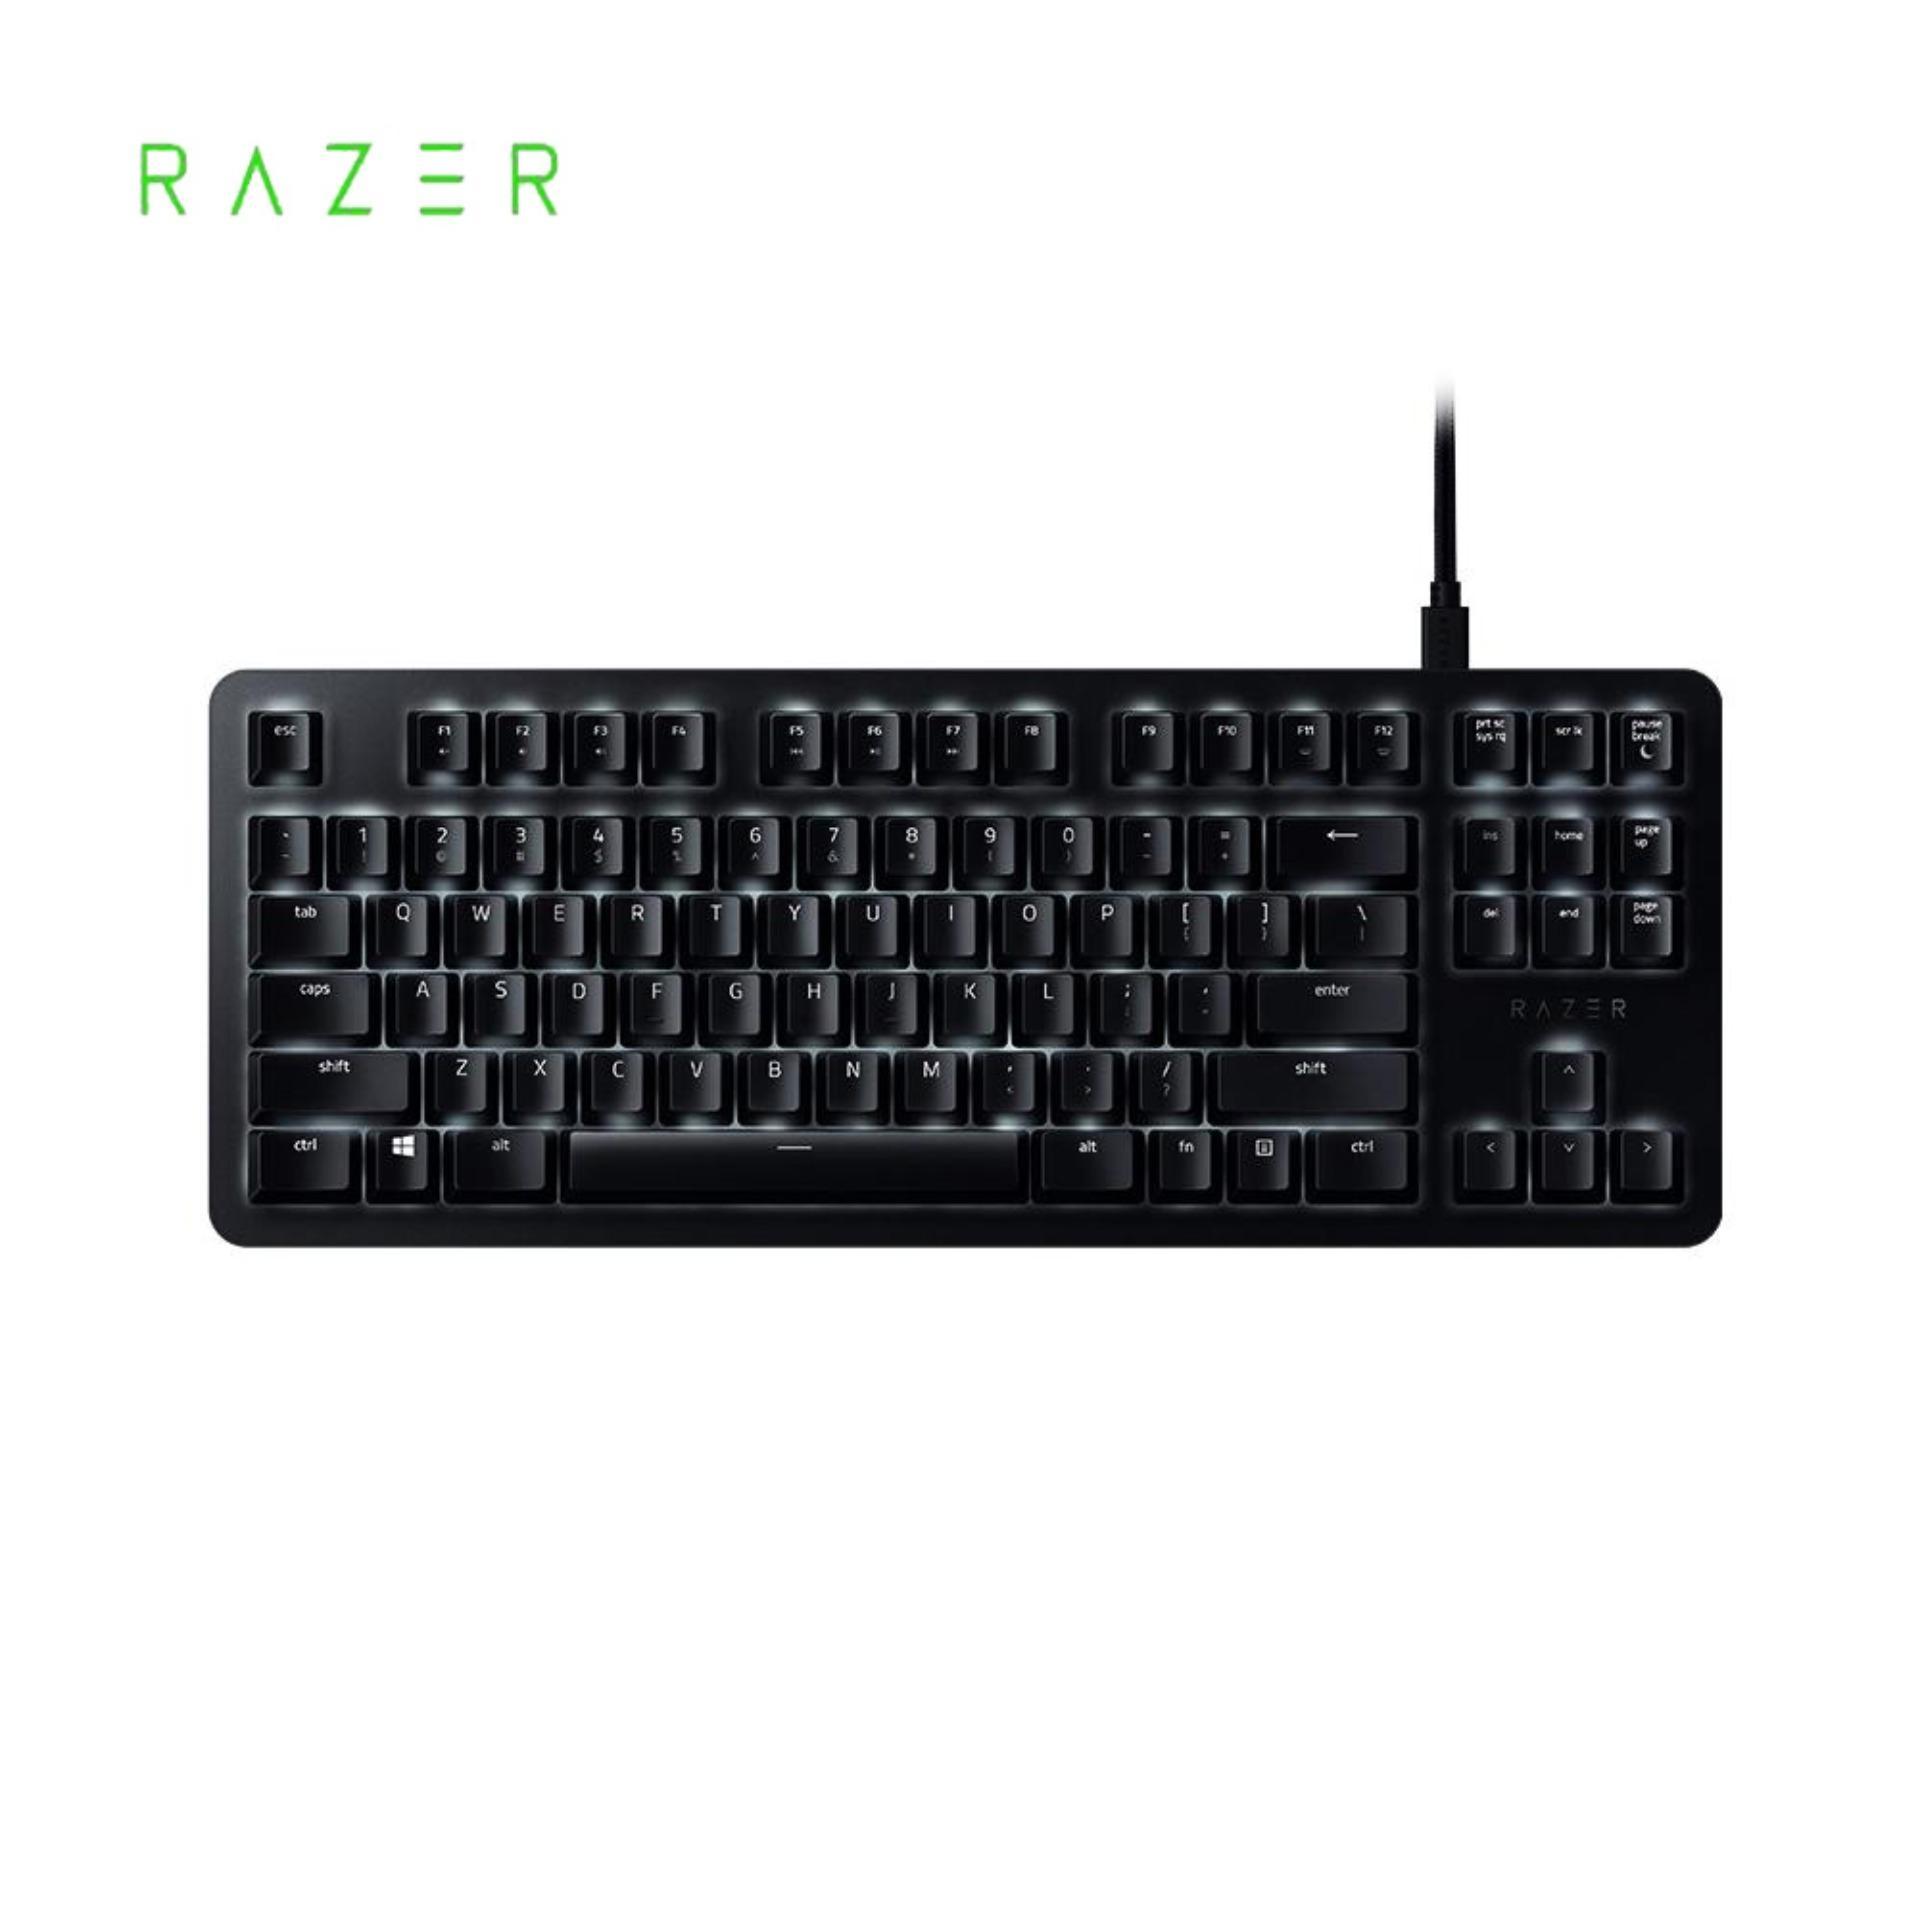 Razer BlackWidow Mechanical Keyboard Gaming Office Orange Mechanical Switches Wired Keyboard 87 Keys Singapore